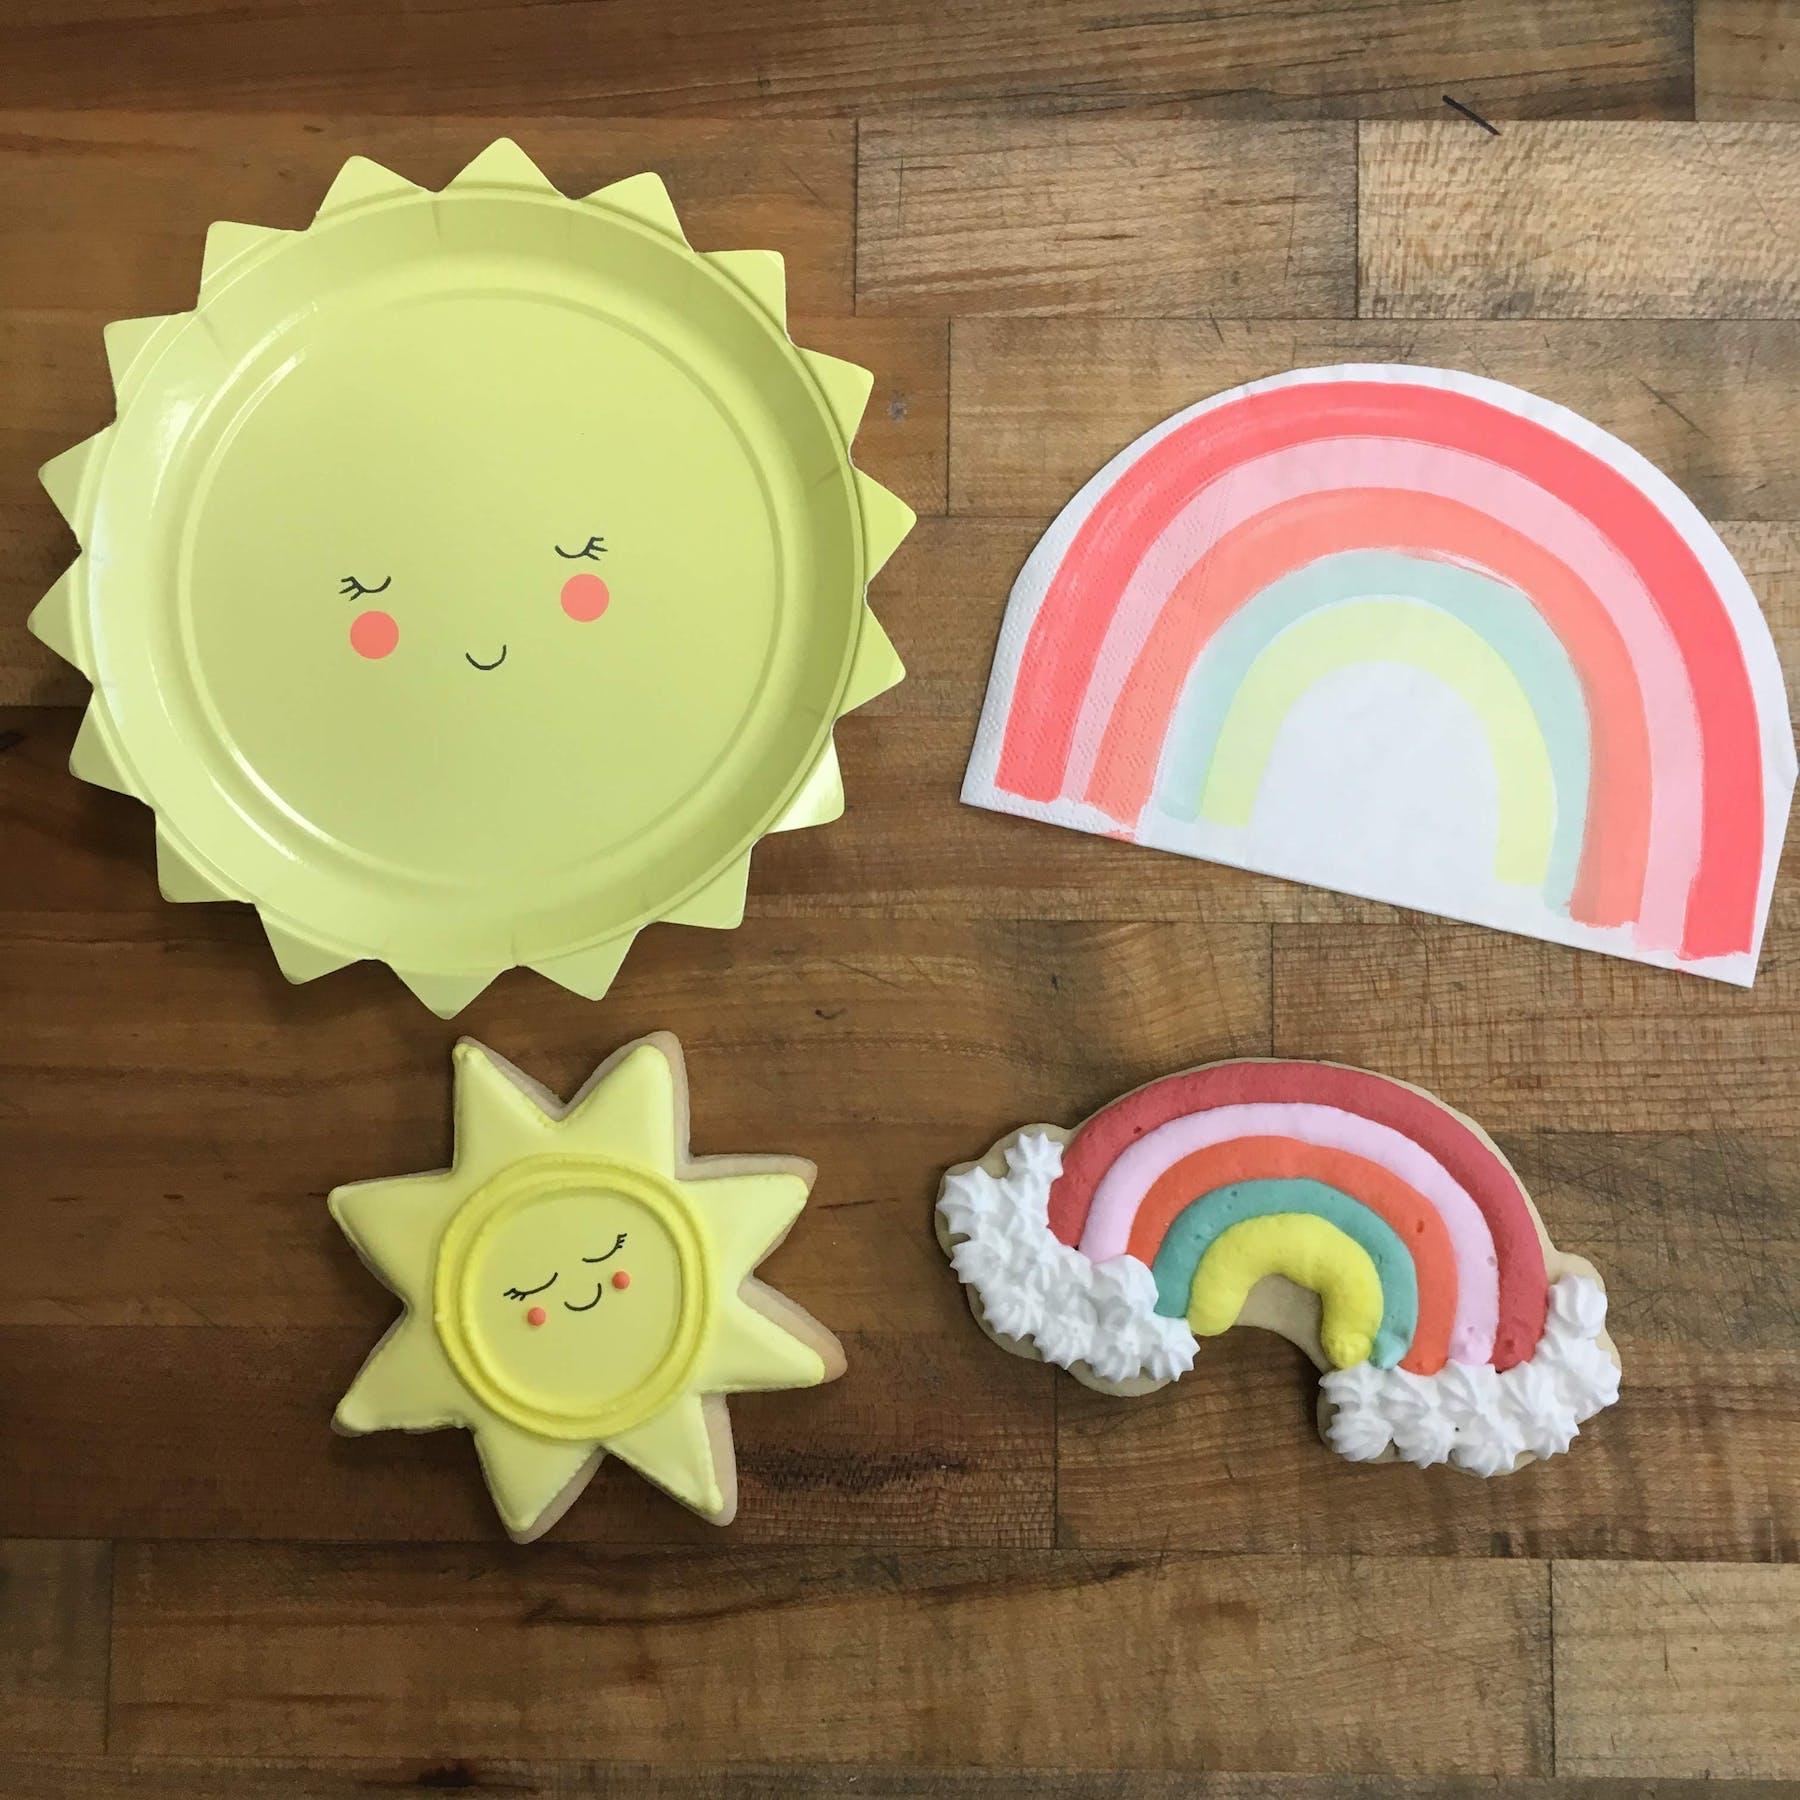 rainbow and sun shaped cookies